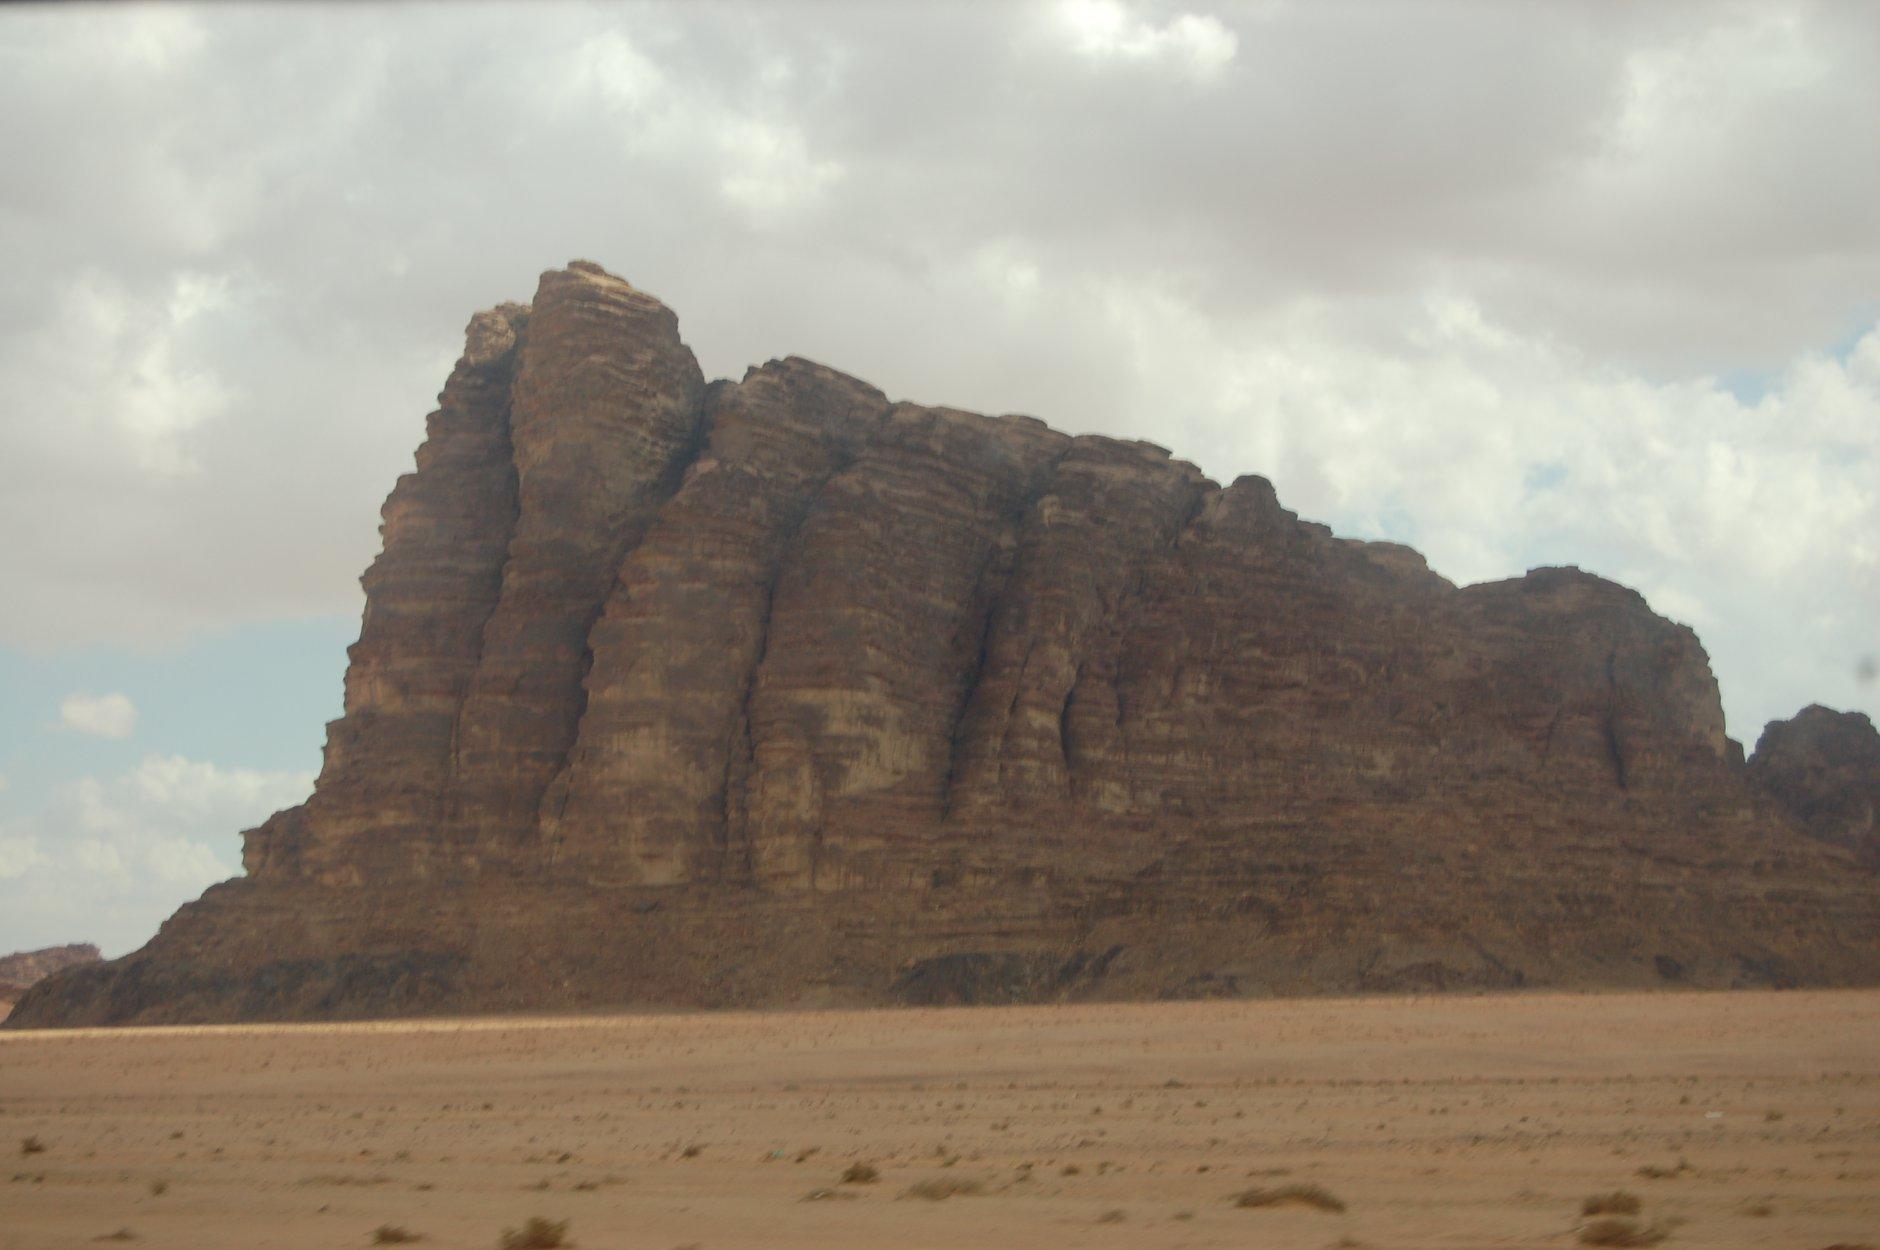 albert-tours-israel-wadi-rum-7-pillars